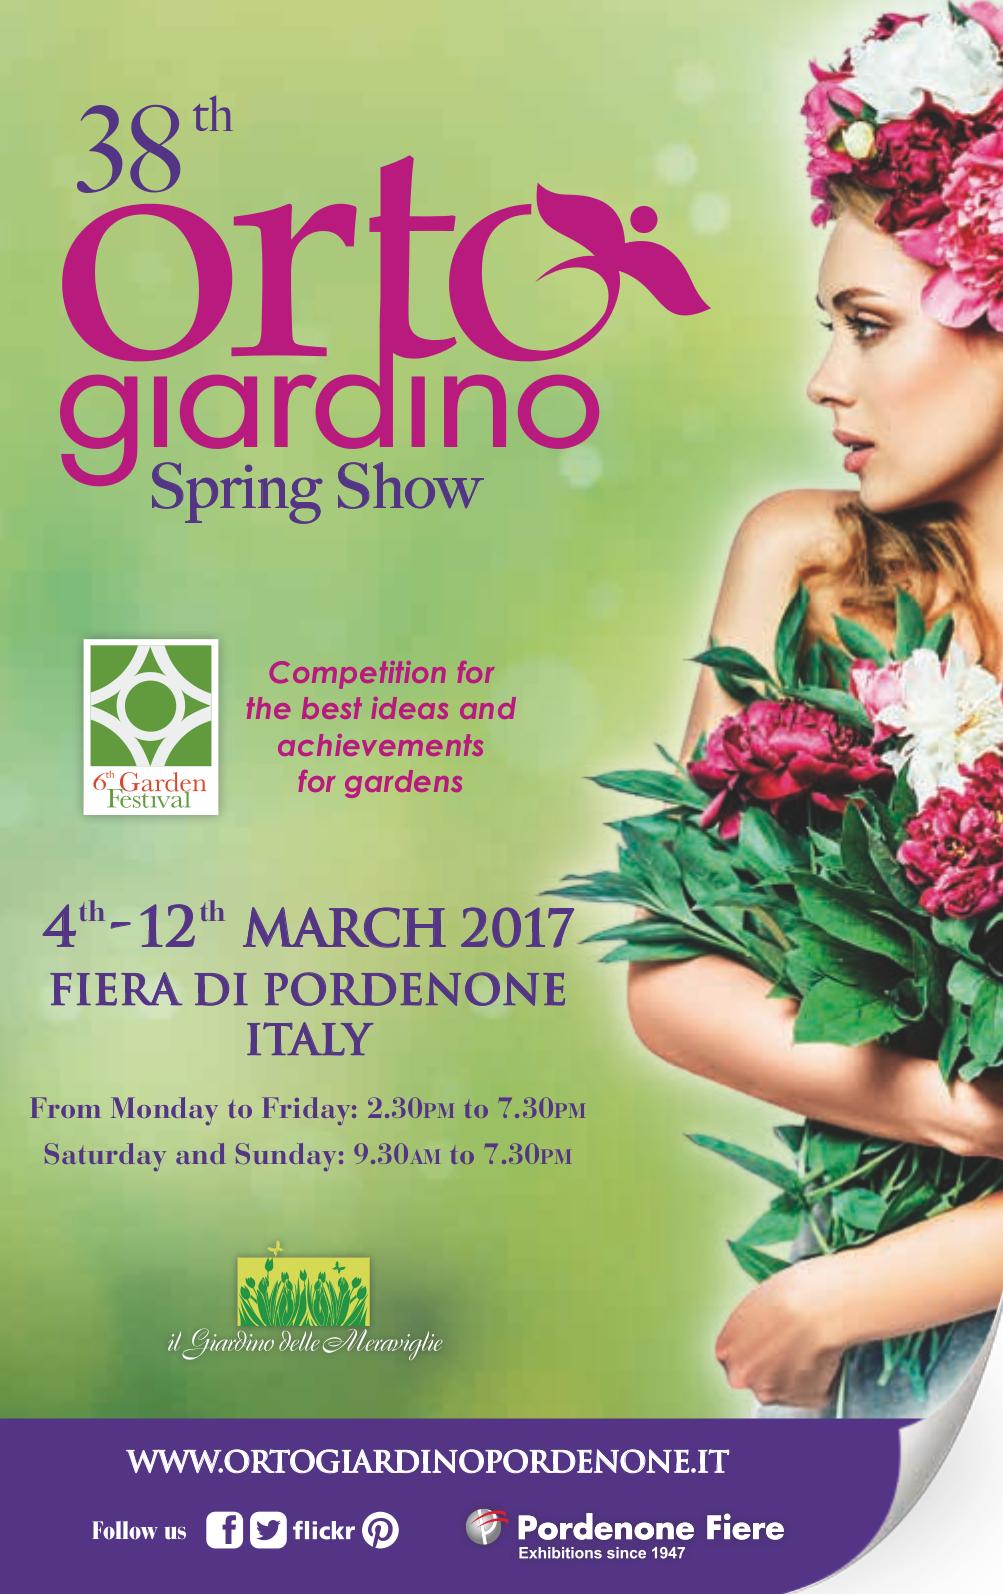 Ortogiardino-show-springtime-pordenone-2017